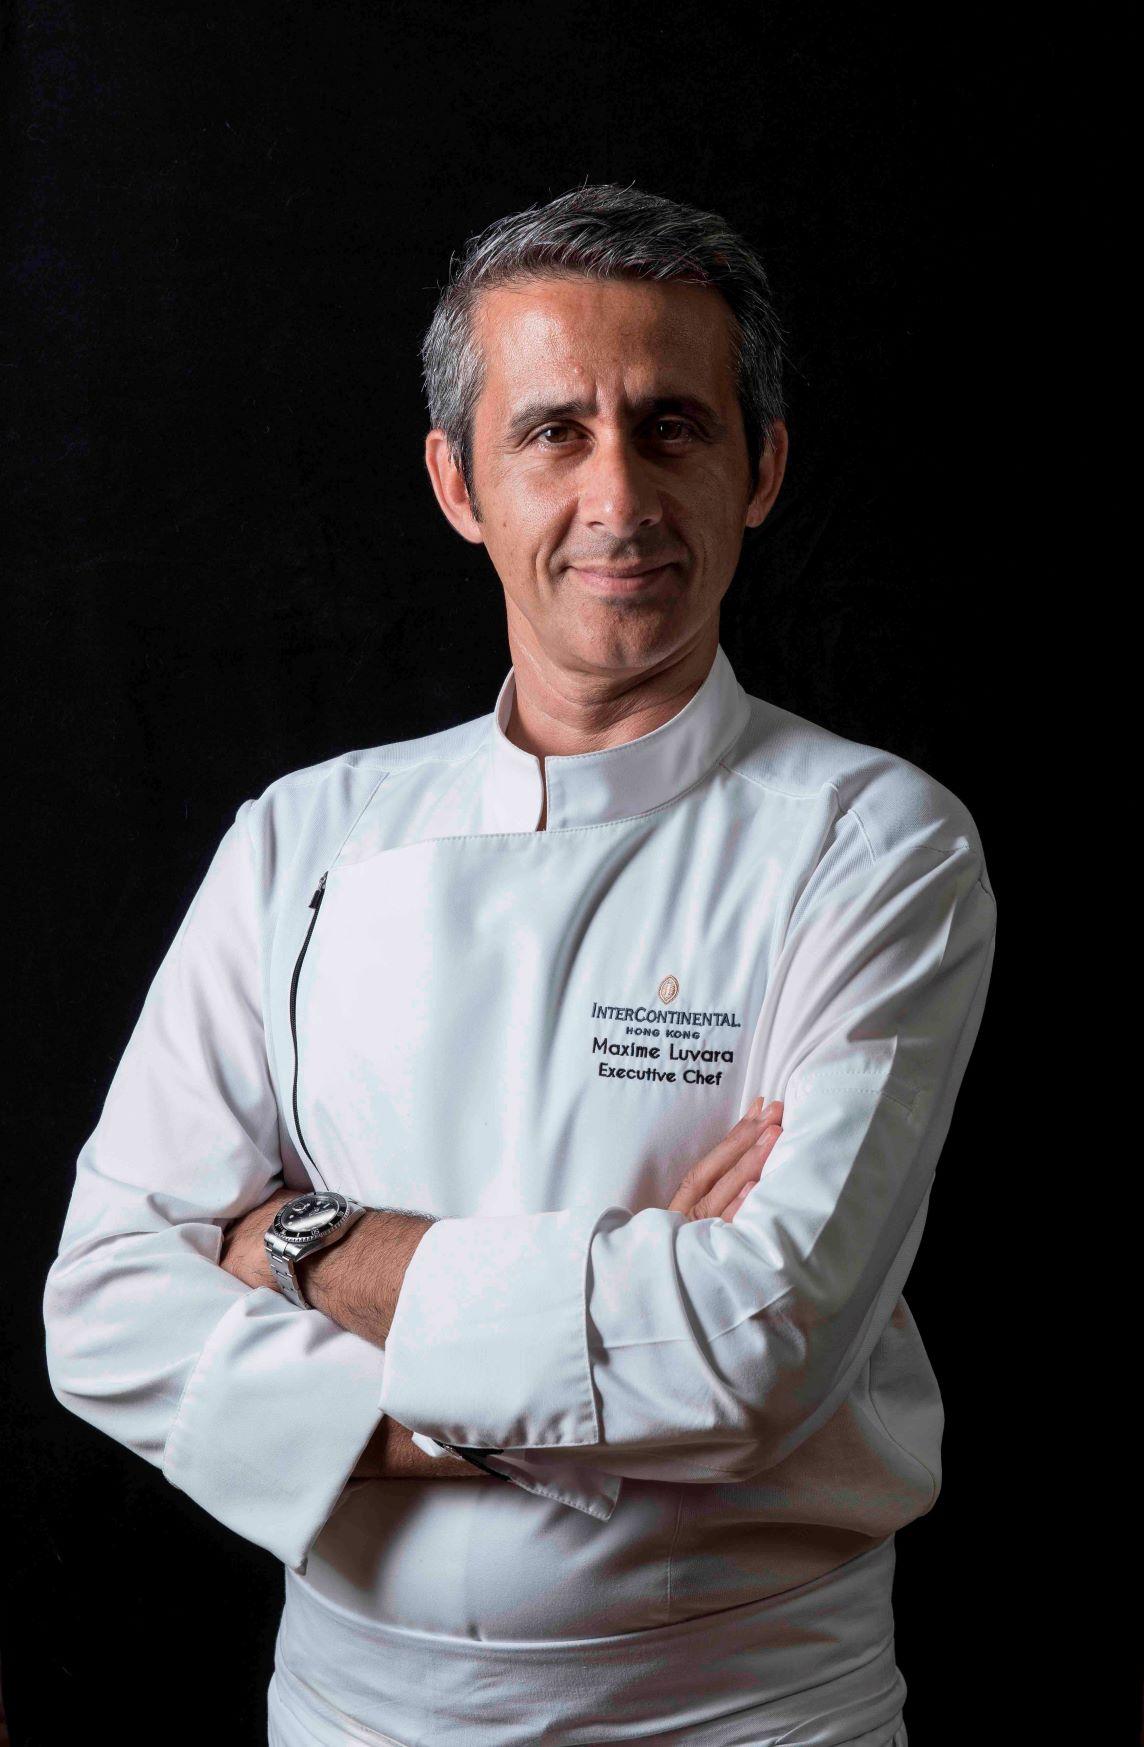 Nuovo executive chef al Badrutt's Palace Hotel